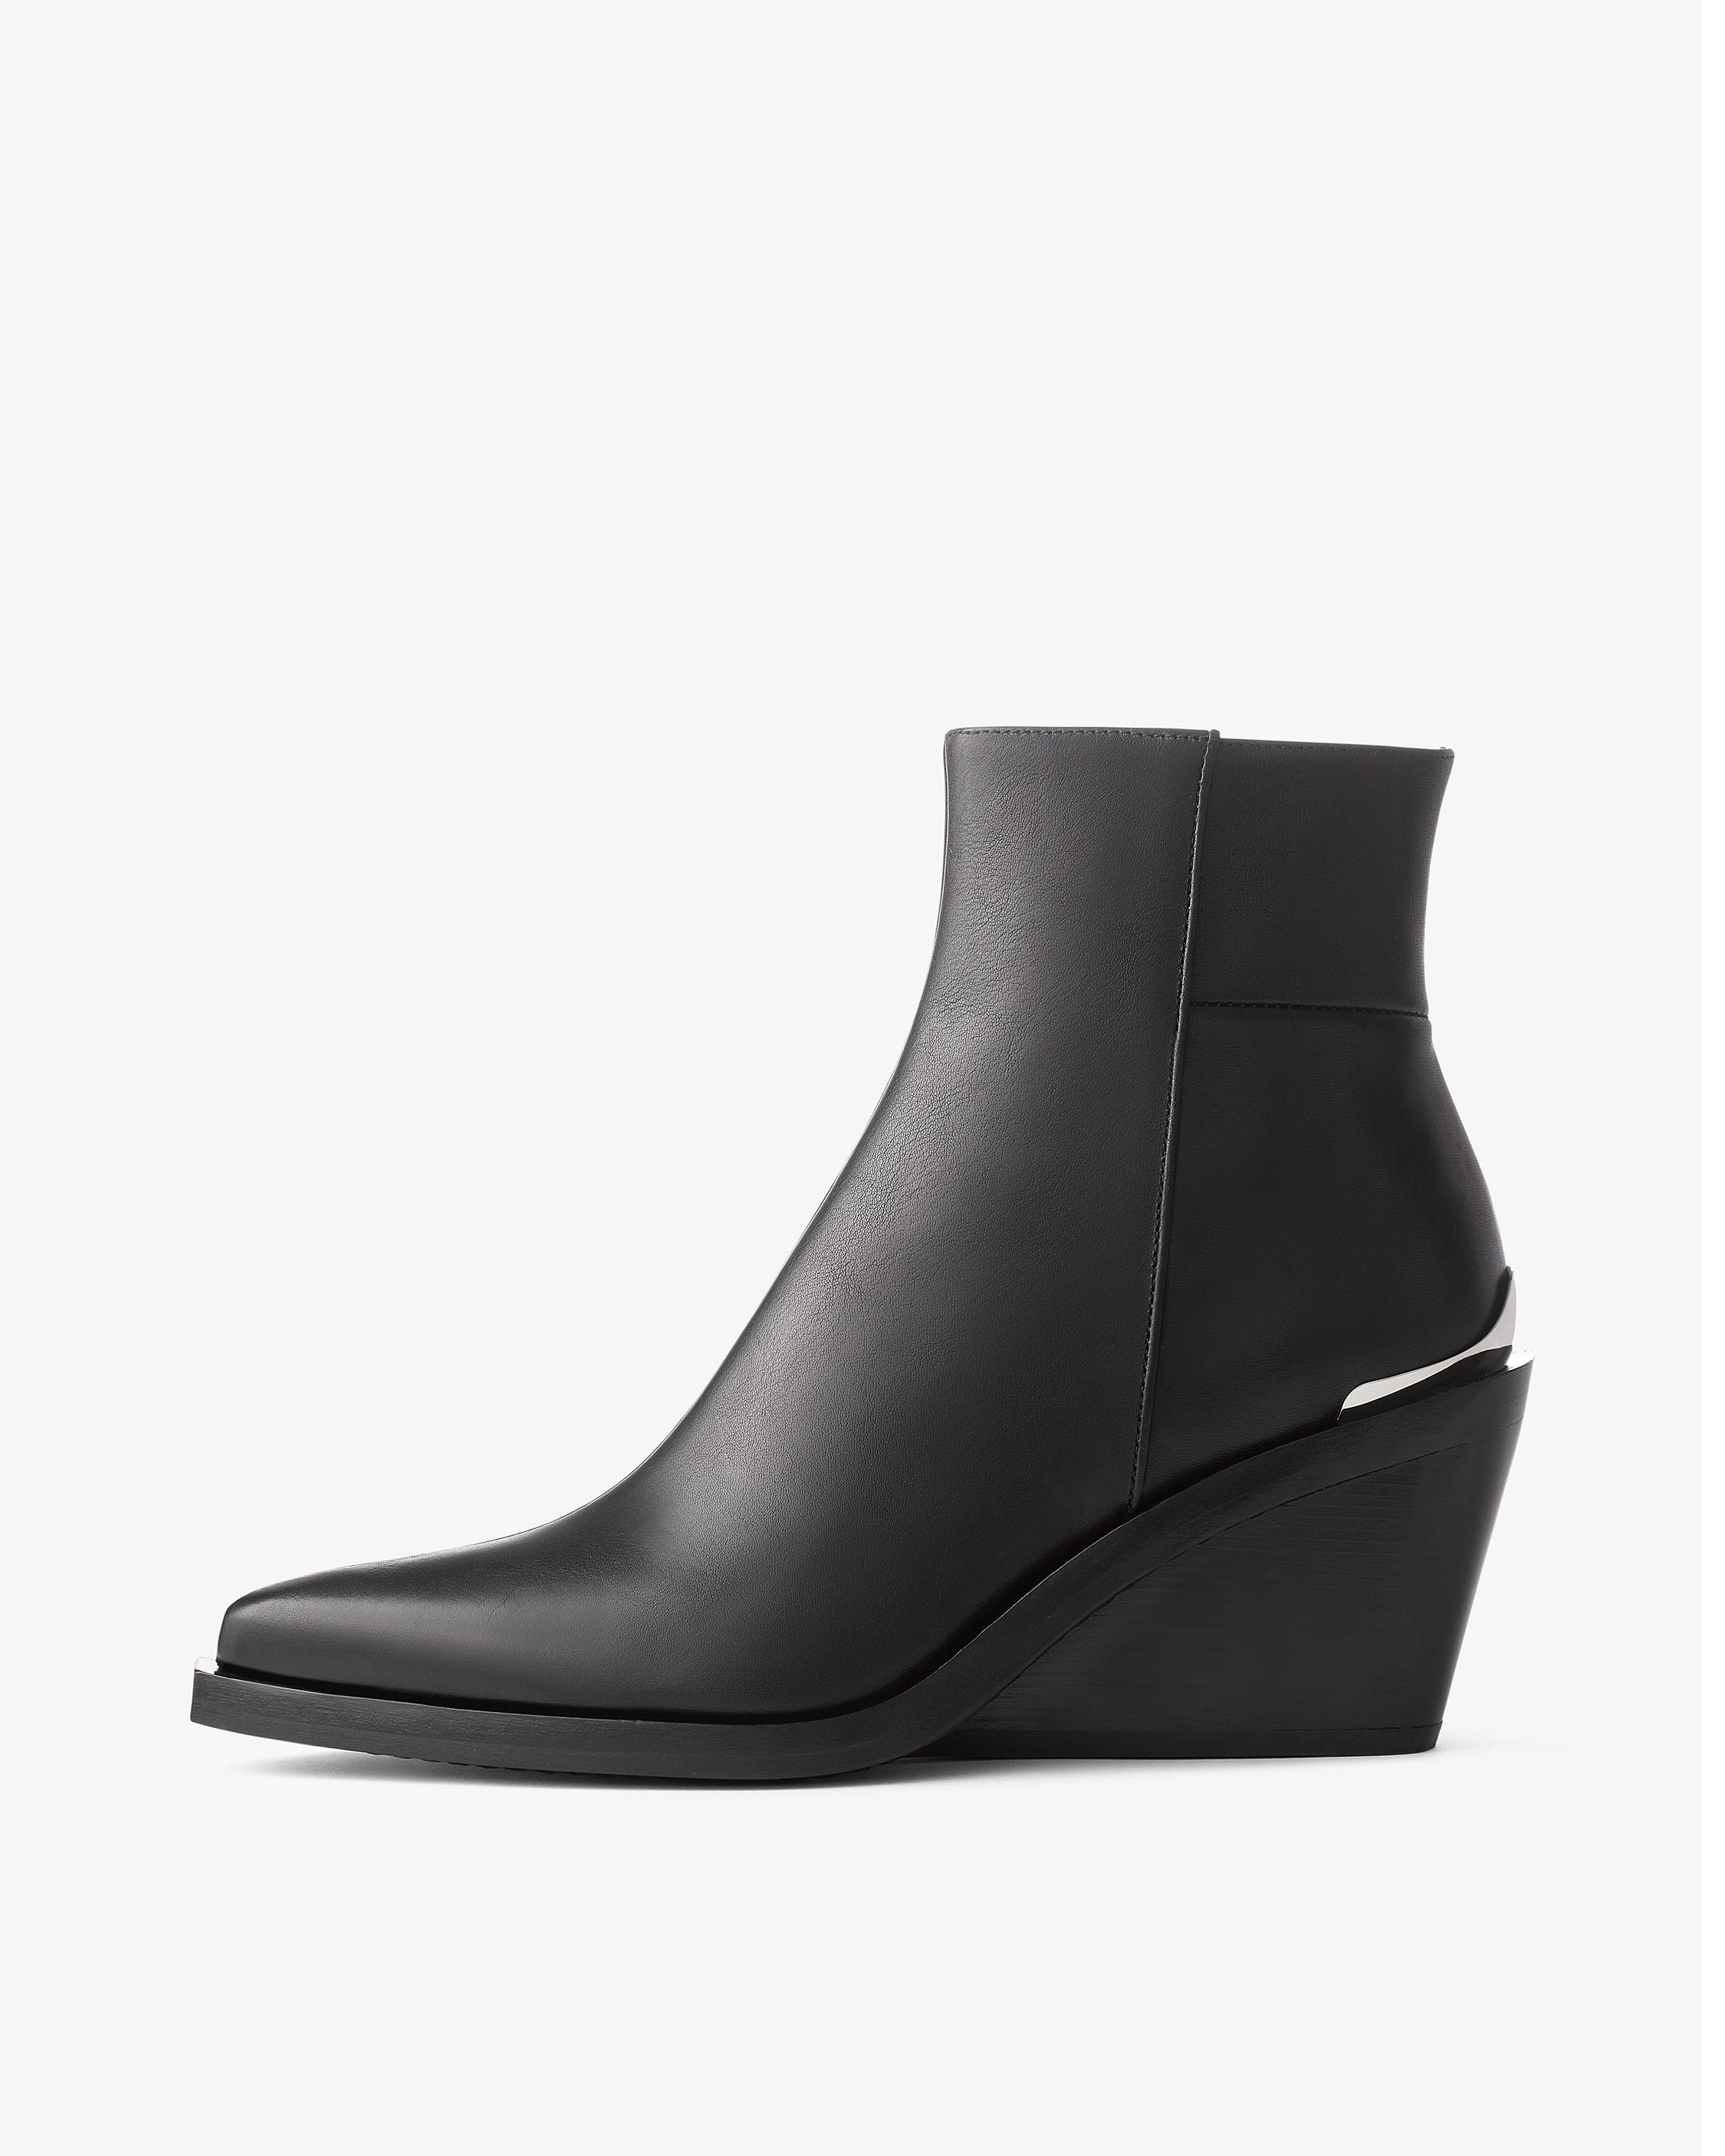 Rag & Bone Woman Buckled Leather Boots Dark Brown Size 35 Rag & Bone bAdsgKC8